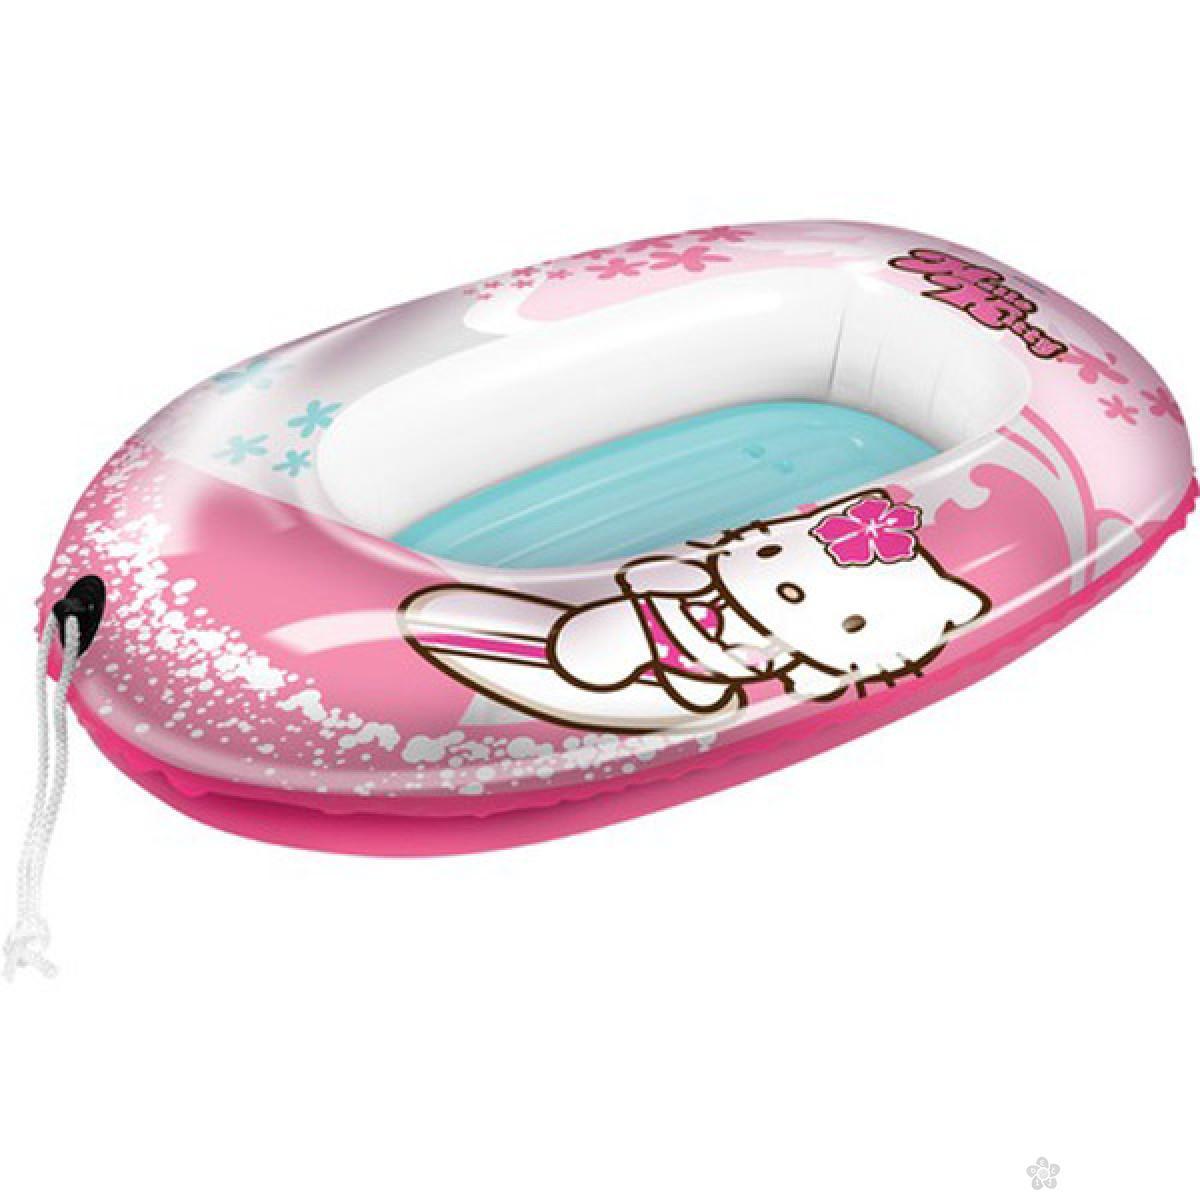 Čamac Mondo Hello Kitty Intex 16321